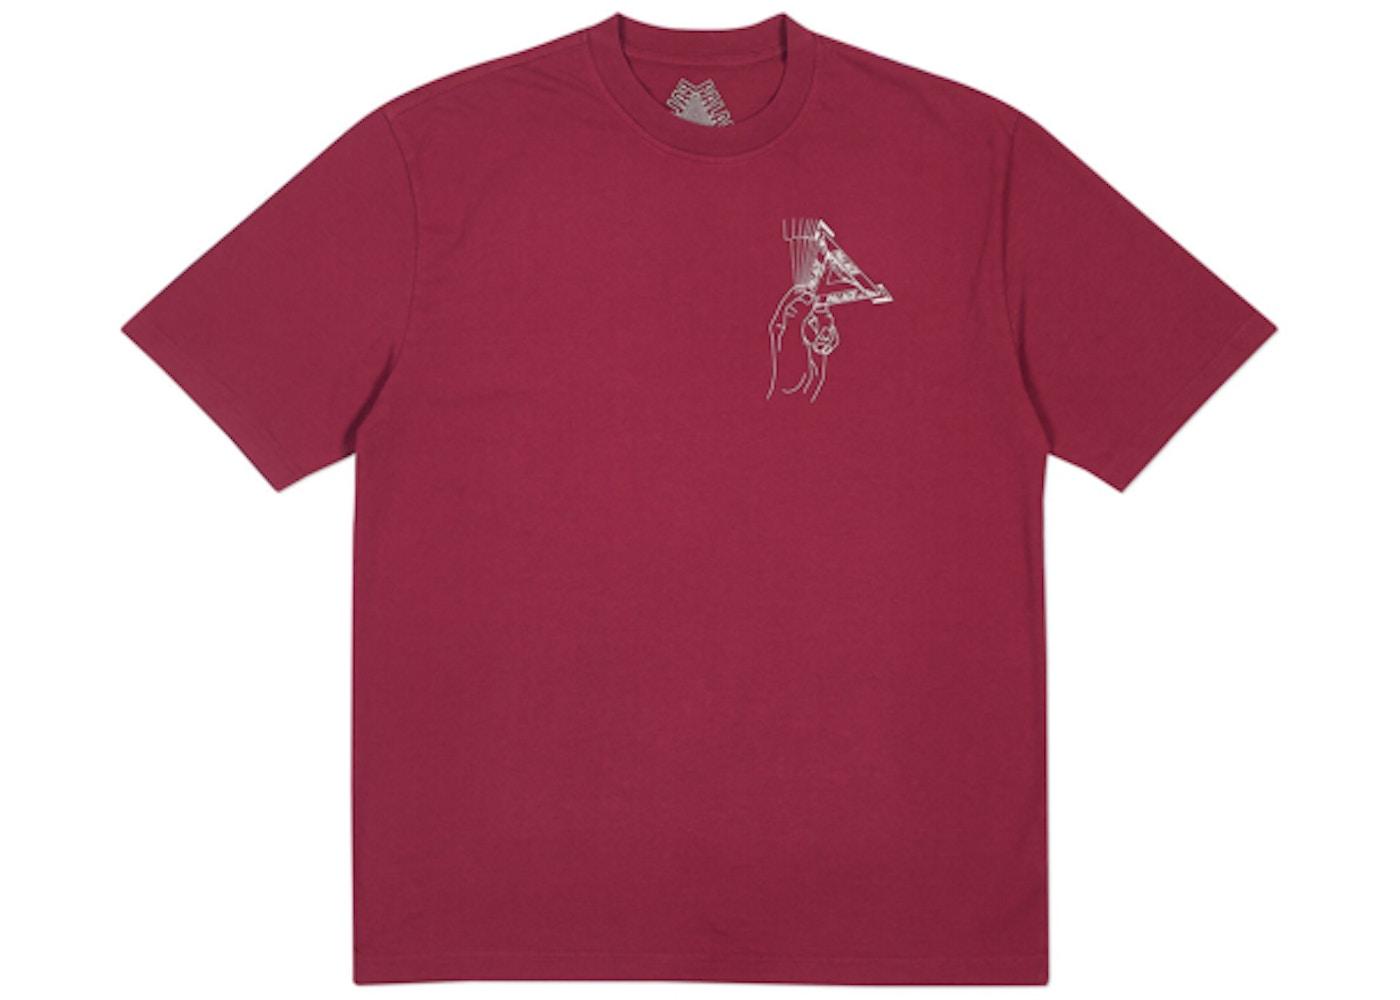 2edc5c71350b0b Palace Grand Master T-Shirt Cherry Red - FW18